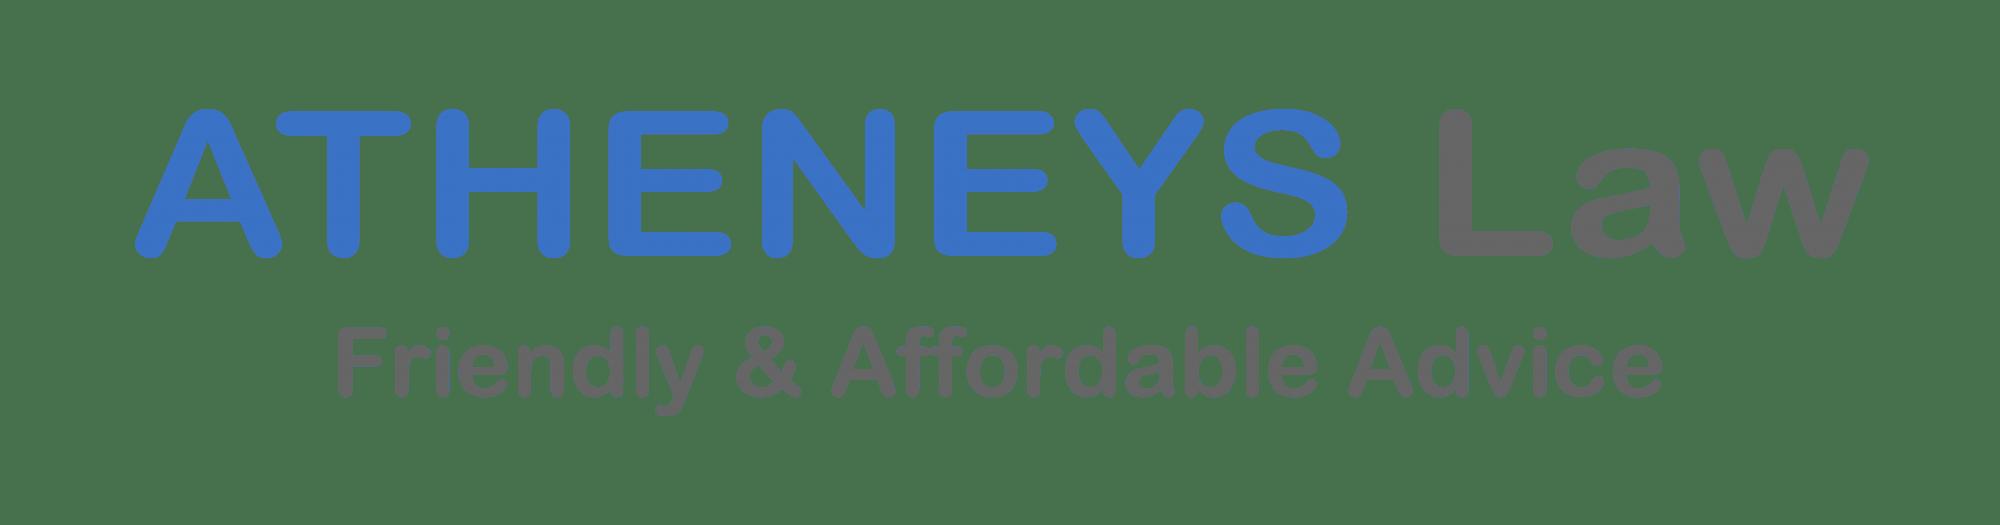 Atheneys - 01202 798867